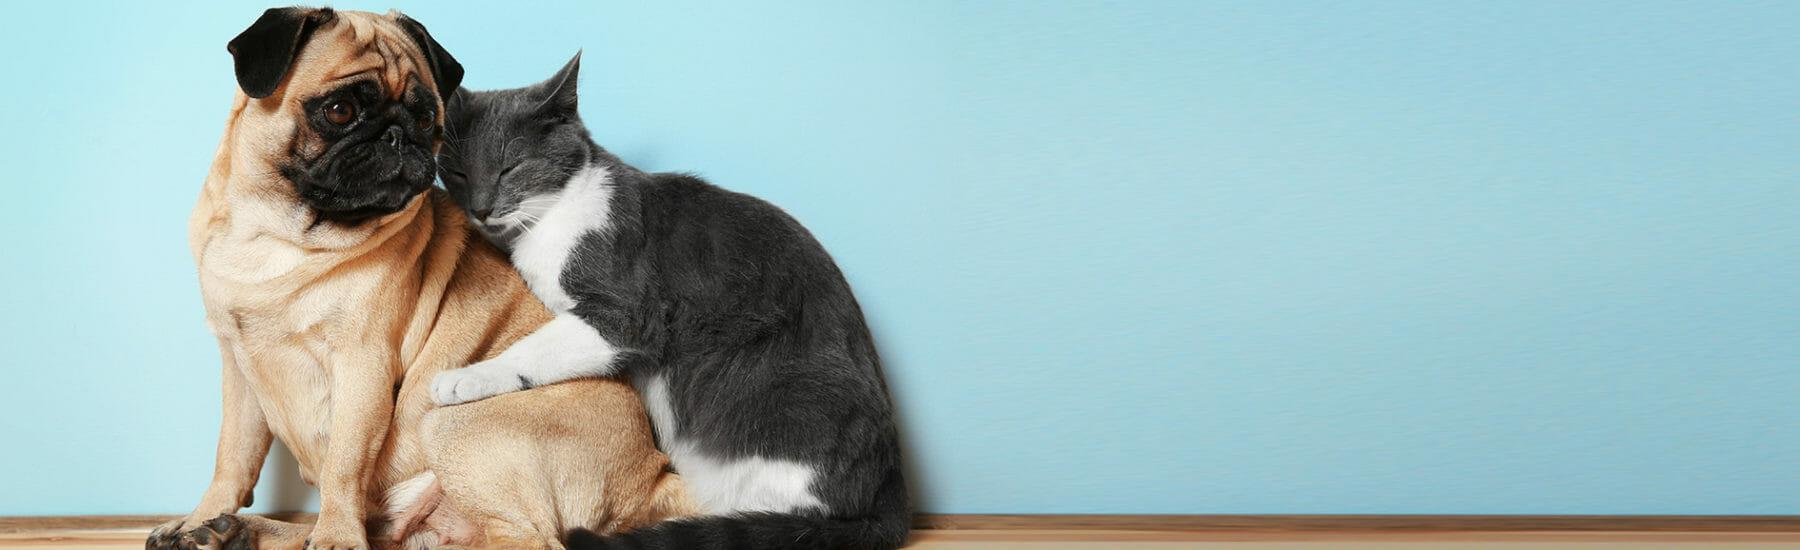 Dog and cat snuggle